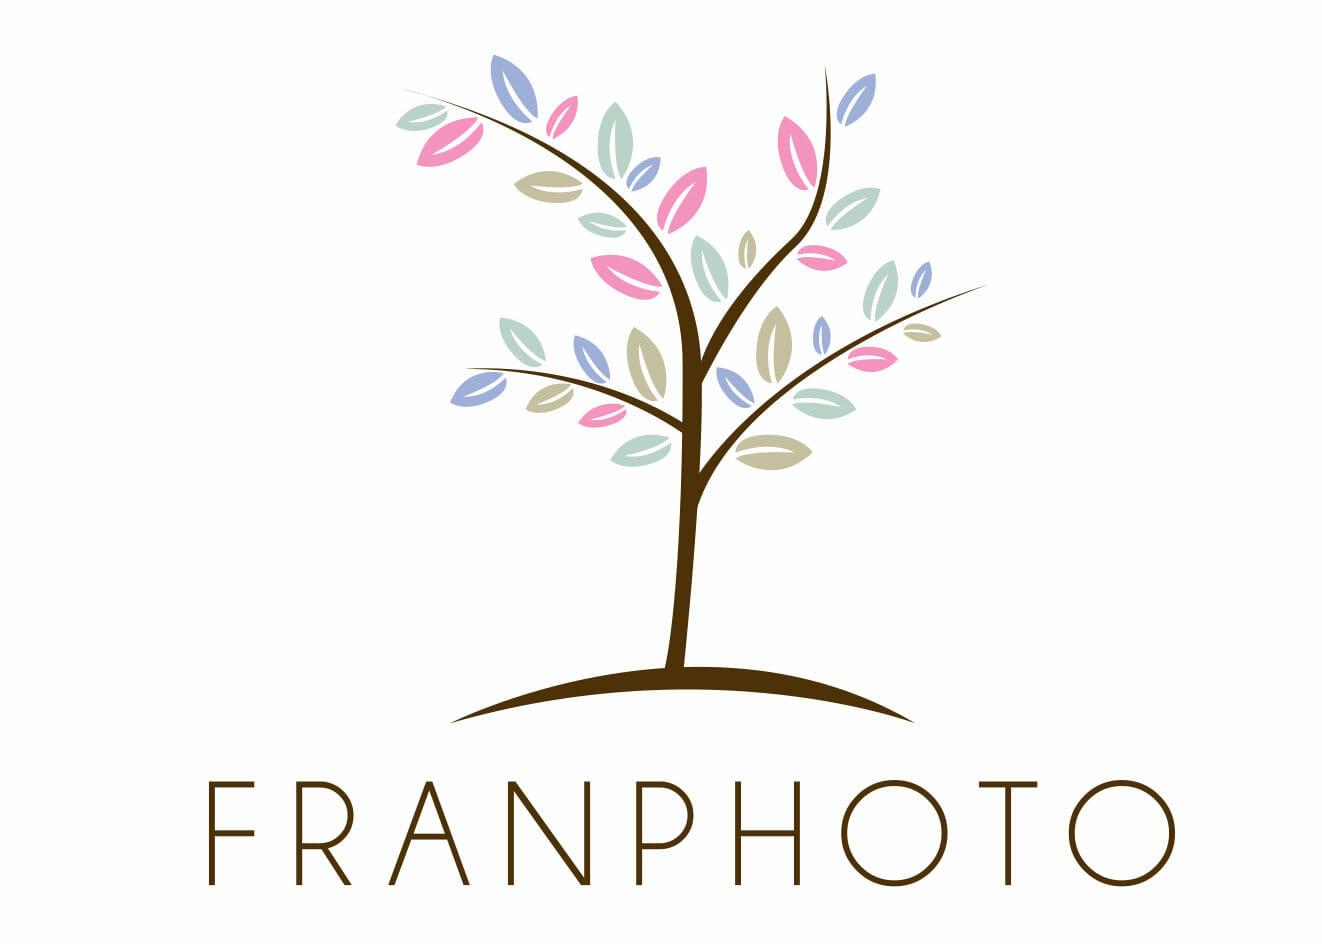 Franphoto